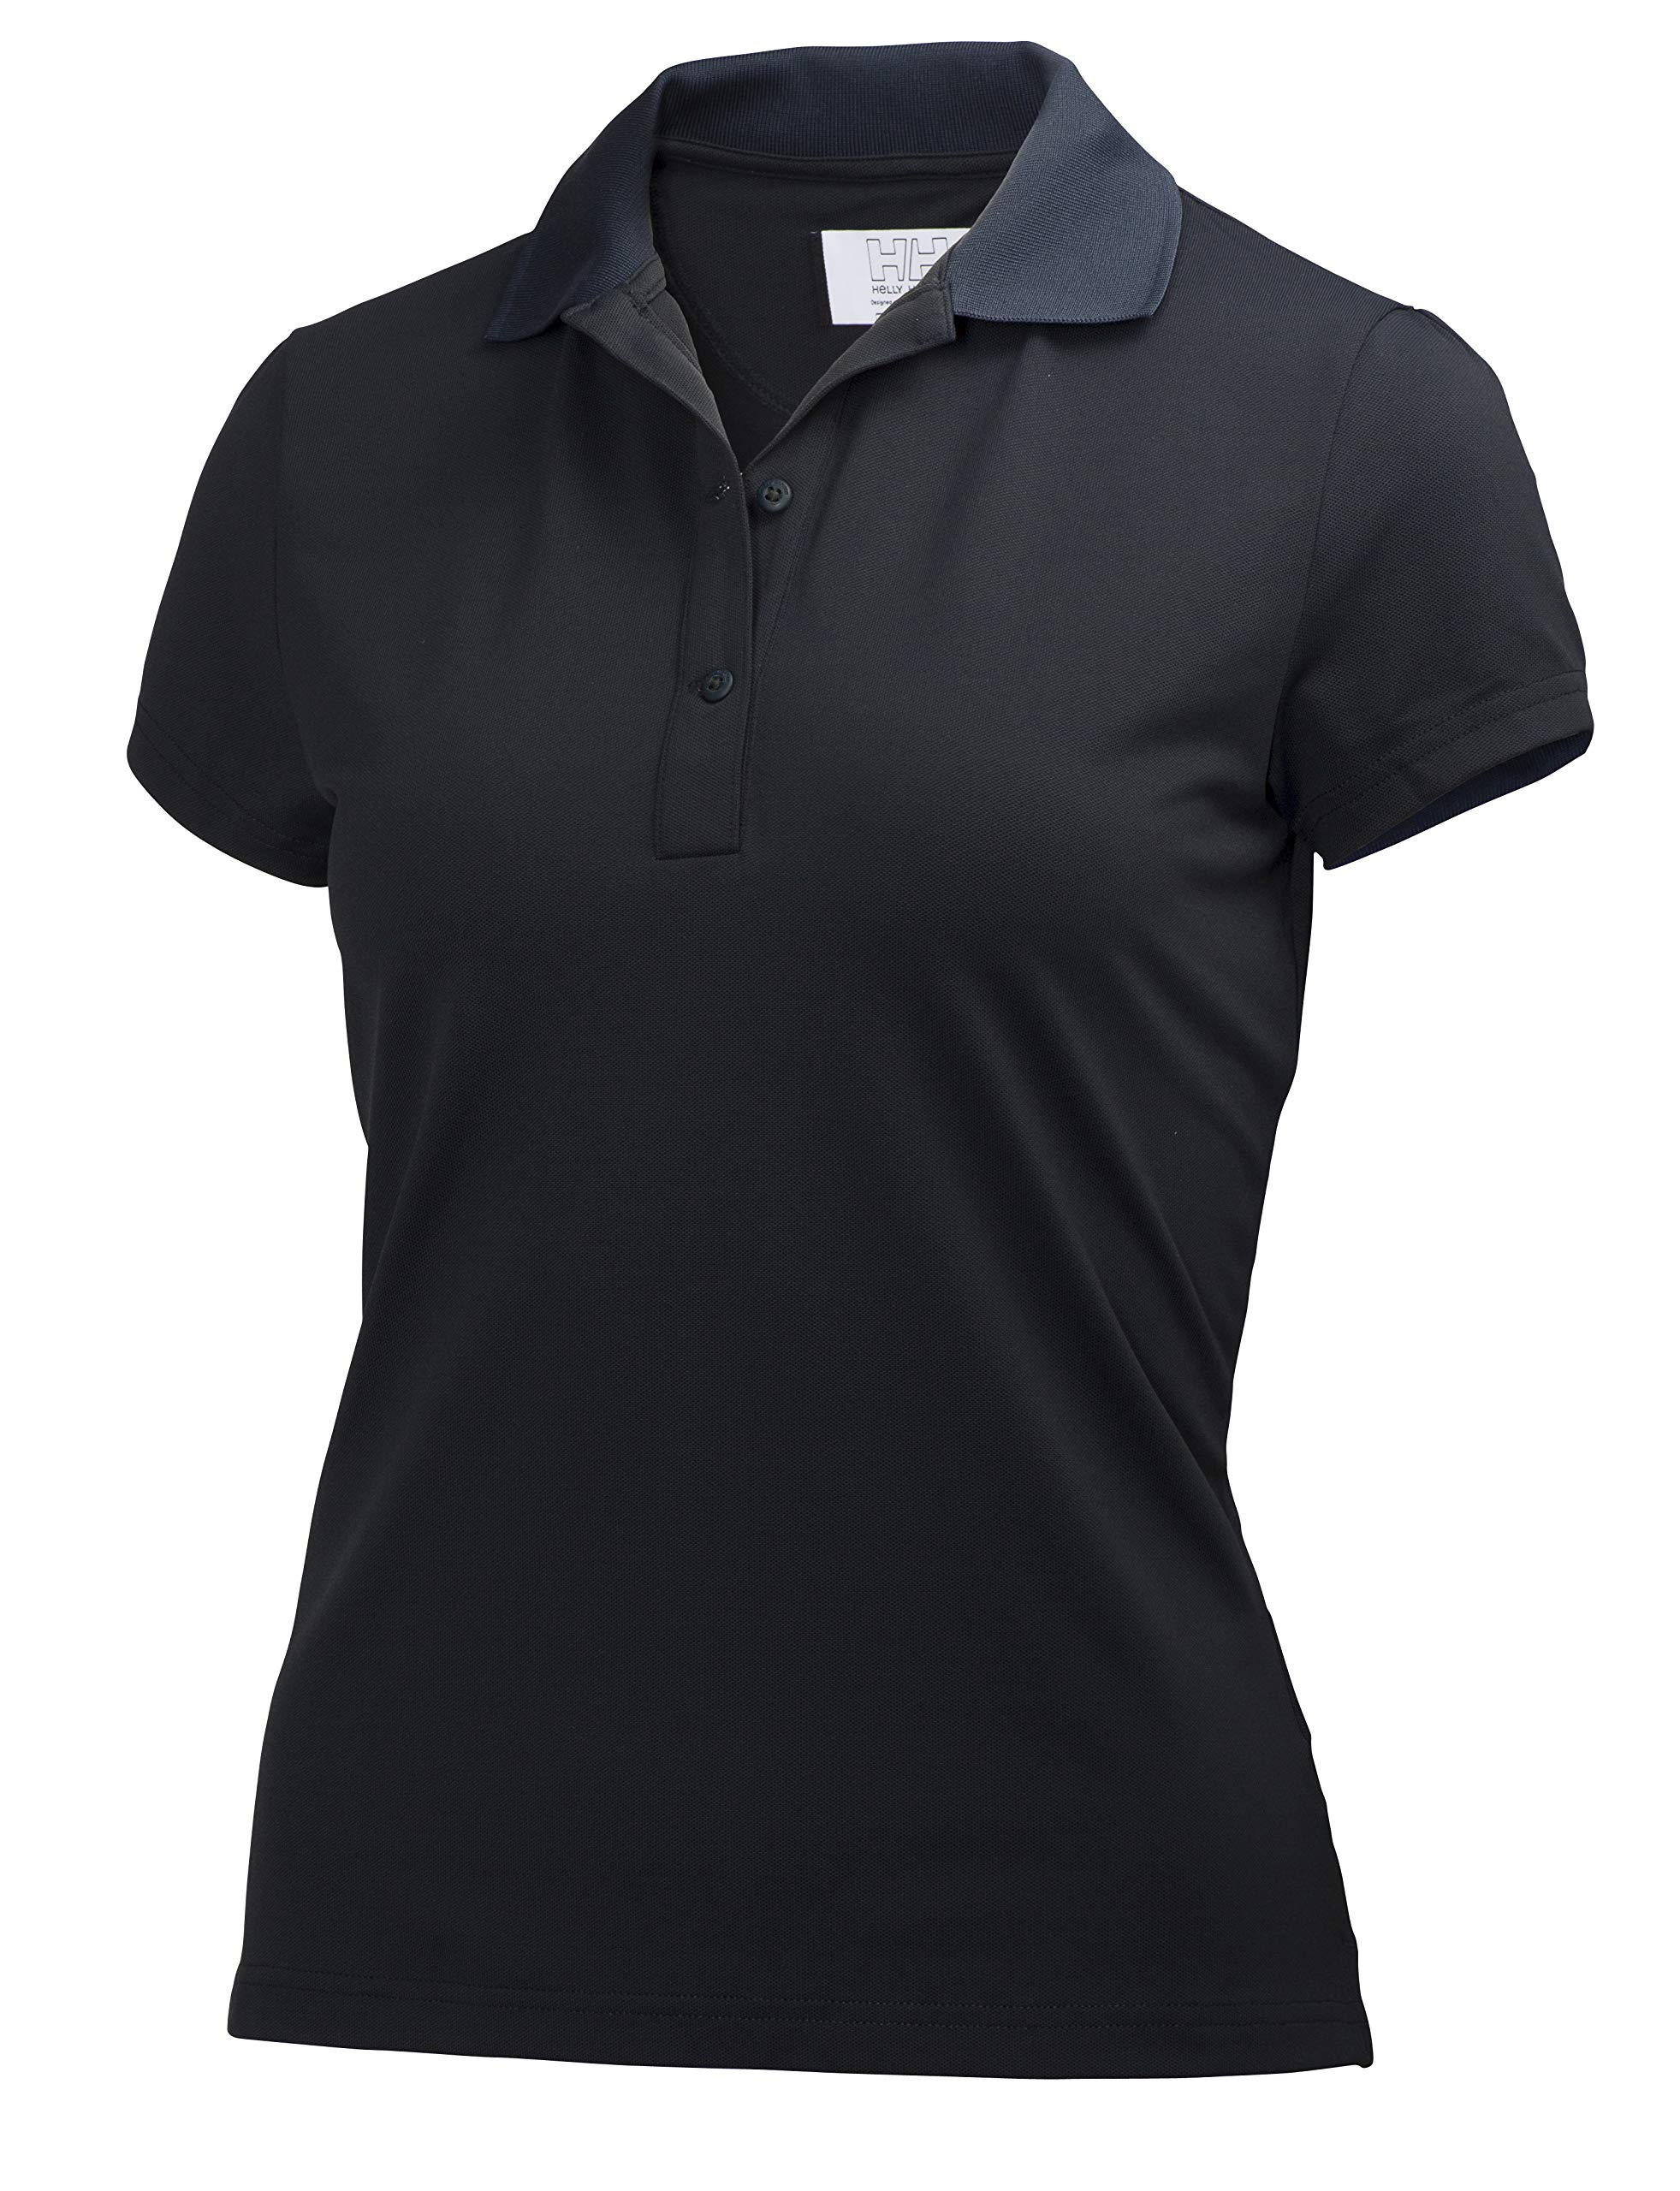 Helly-Hansen Womens Crew Tech Polo Shirt